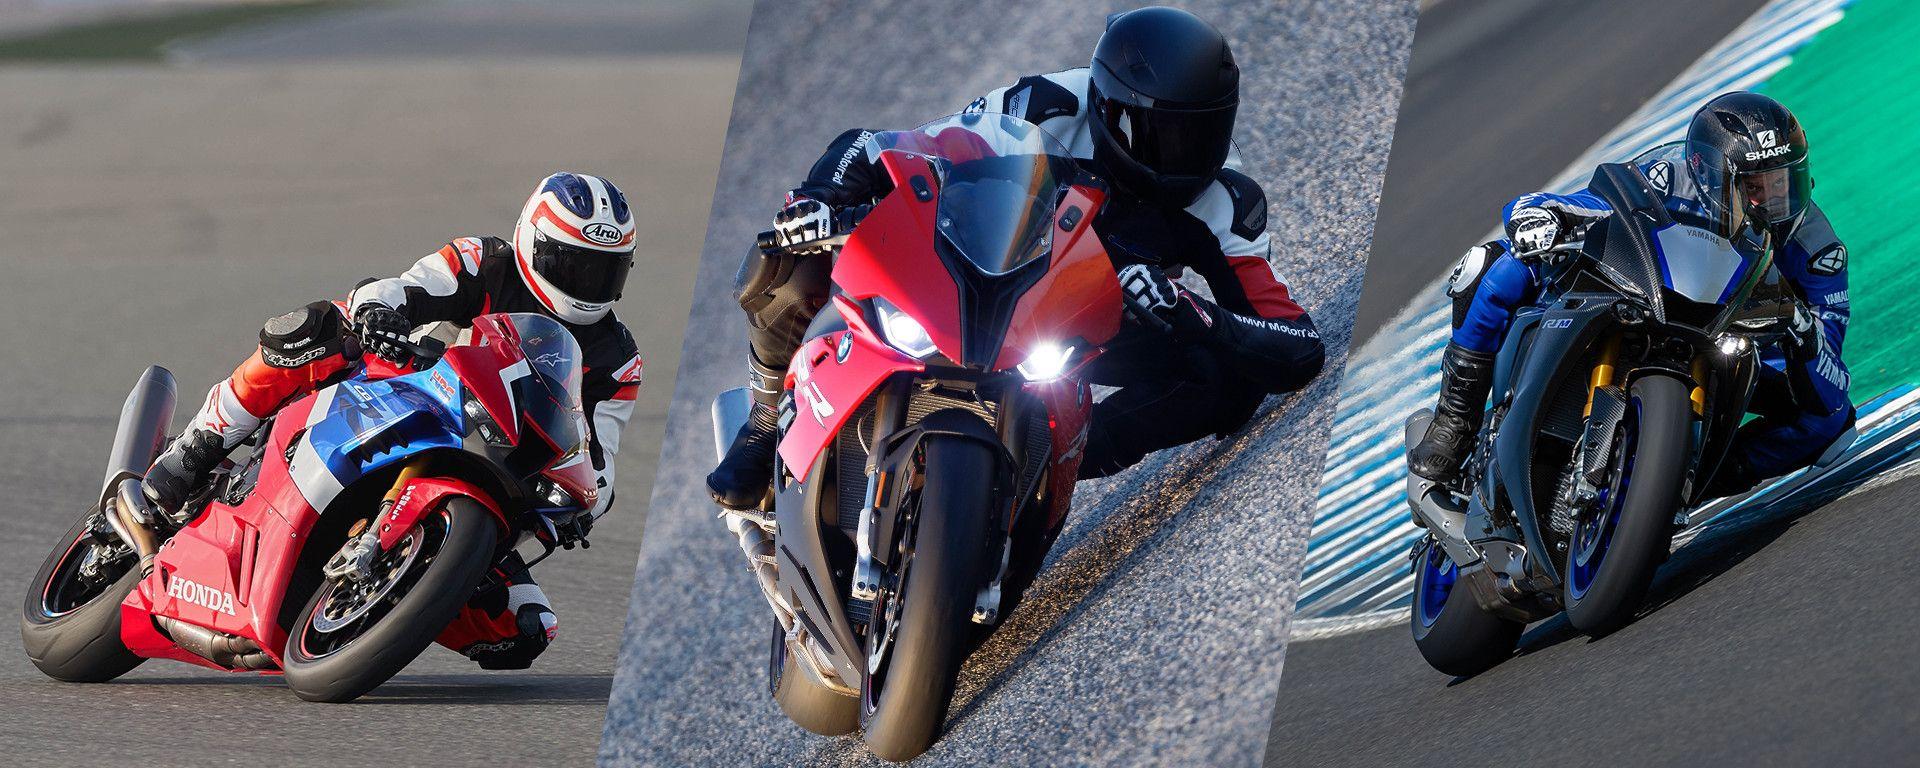 Test: Honda Fireblade SP vs Yamaha R1 M vs BMW S 1000 RR